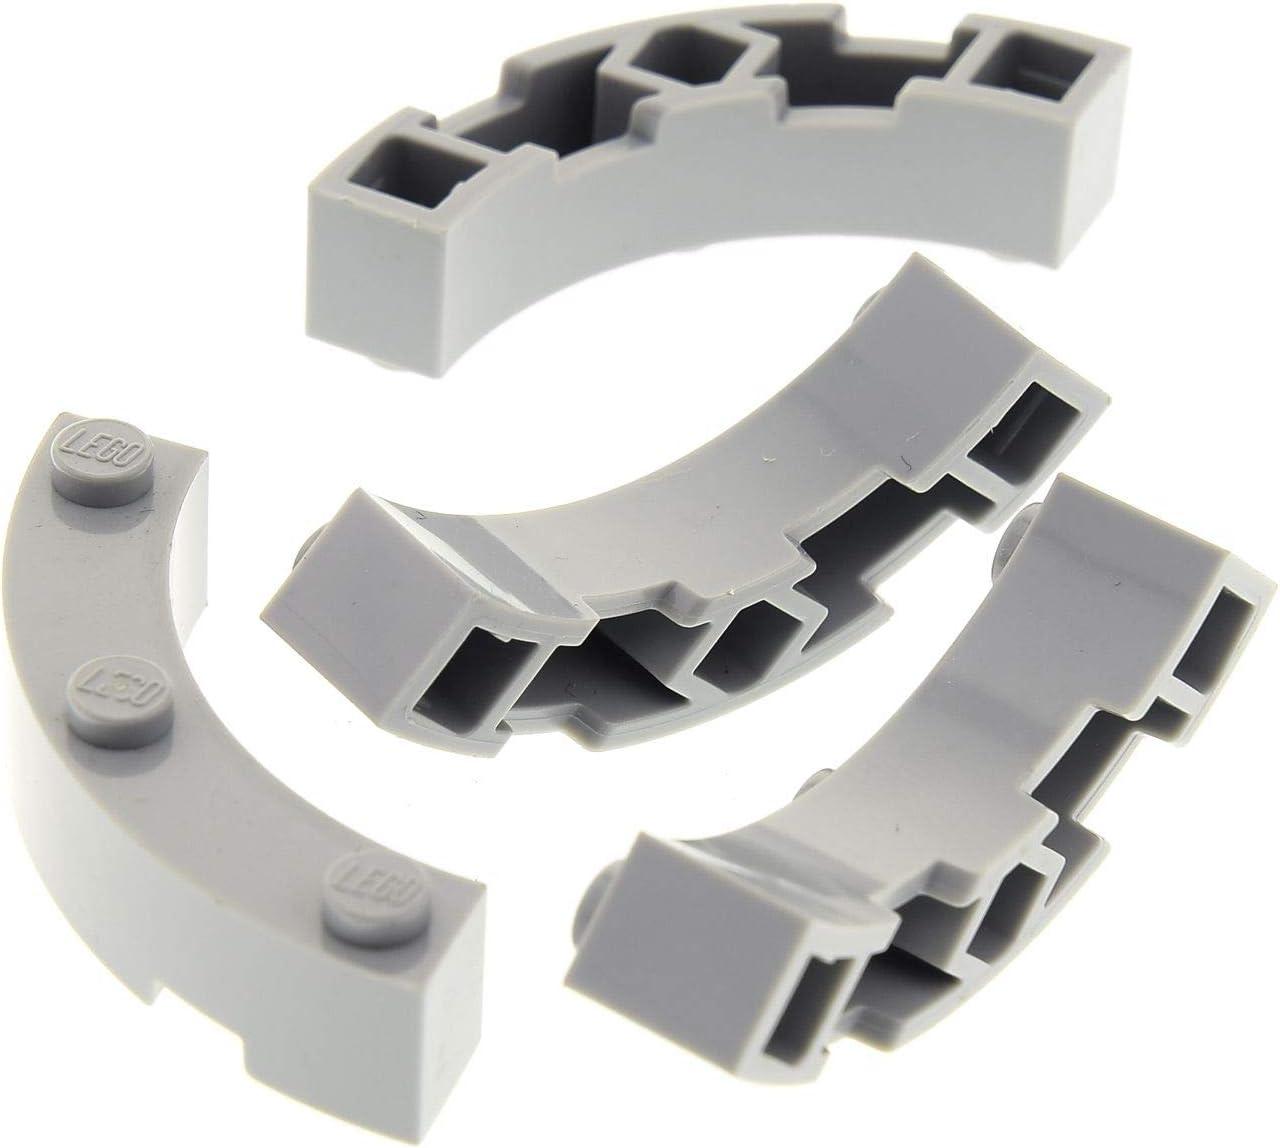 Lego Black Brick Round 4X4 10 Pieces NEW